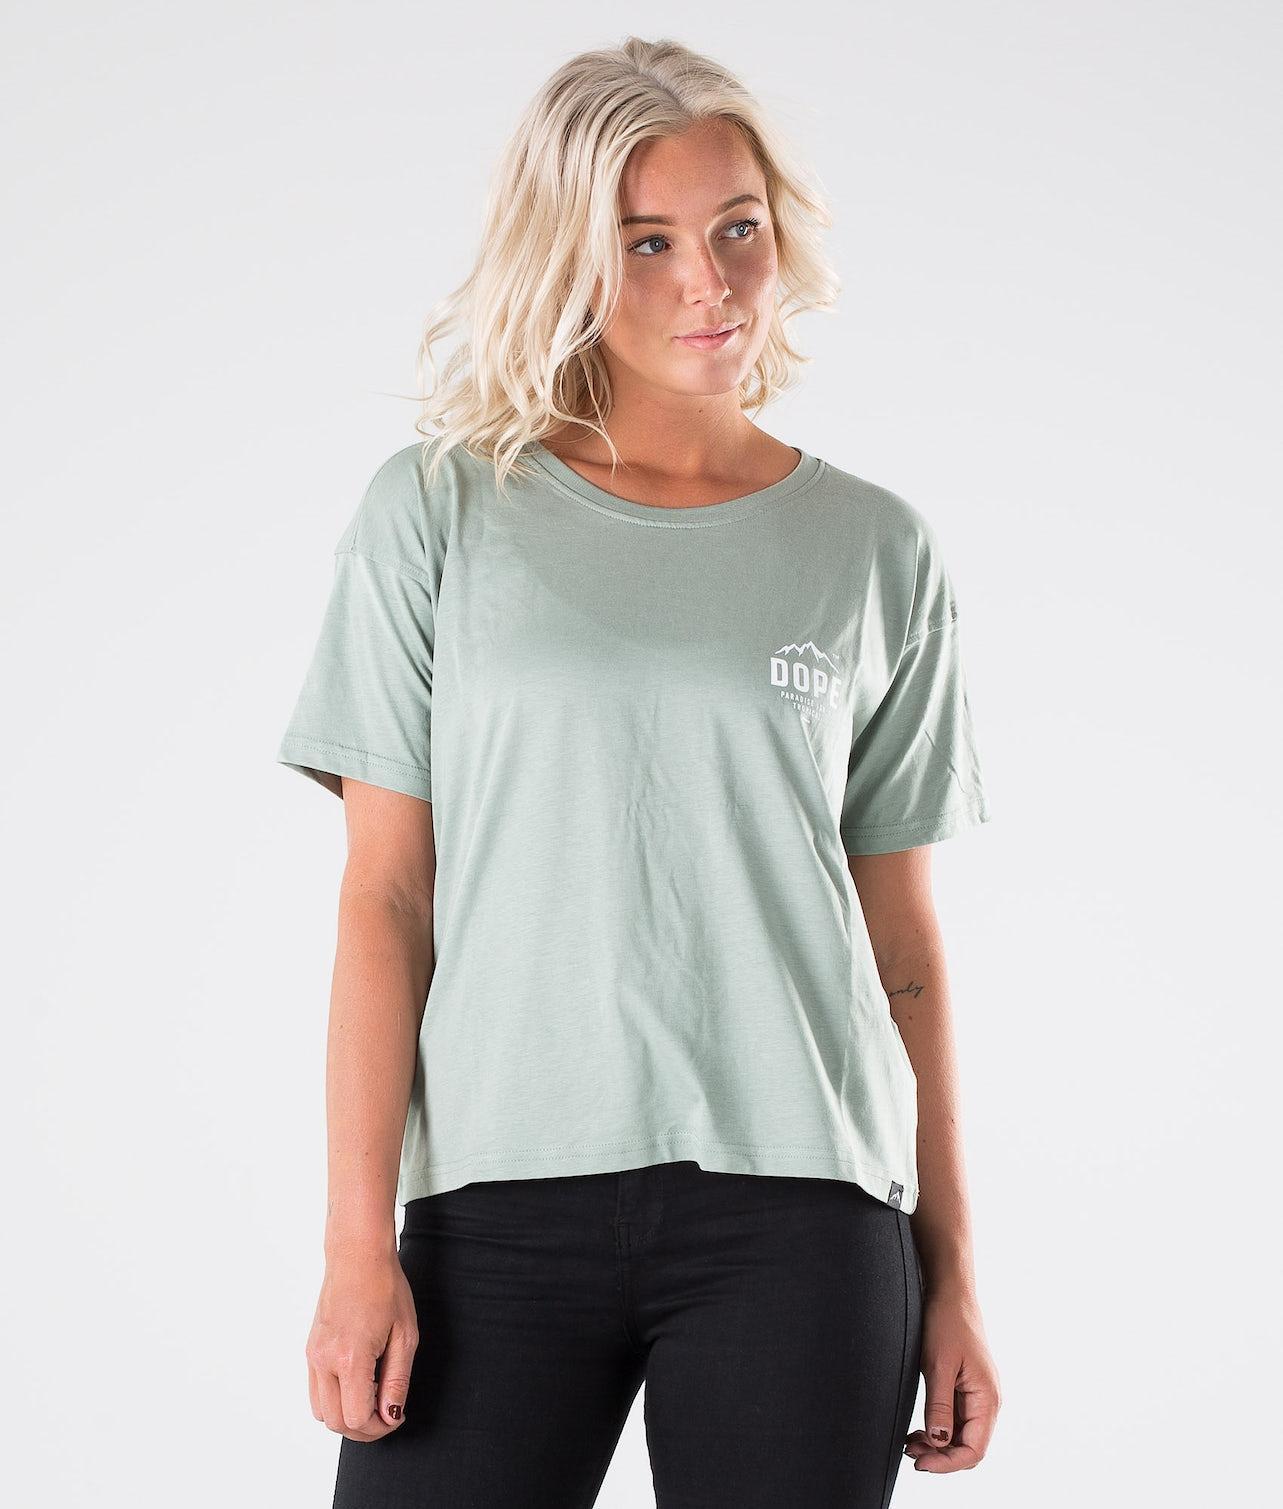 Dope Grand Paradise II T-shirt Faded Green